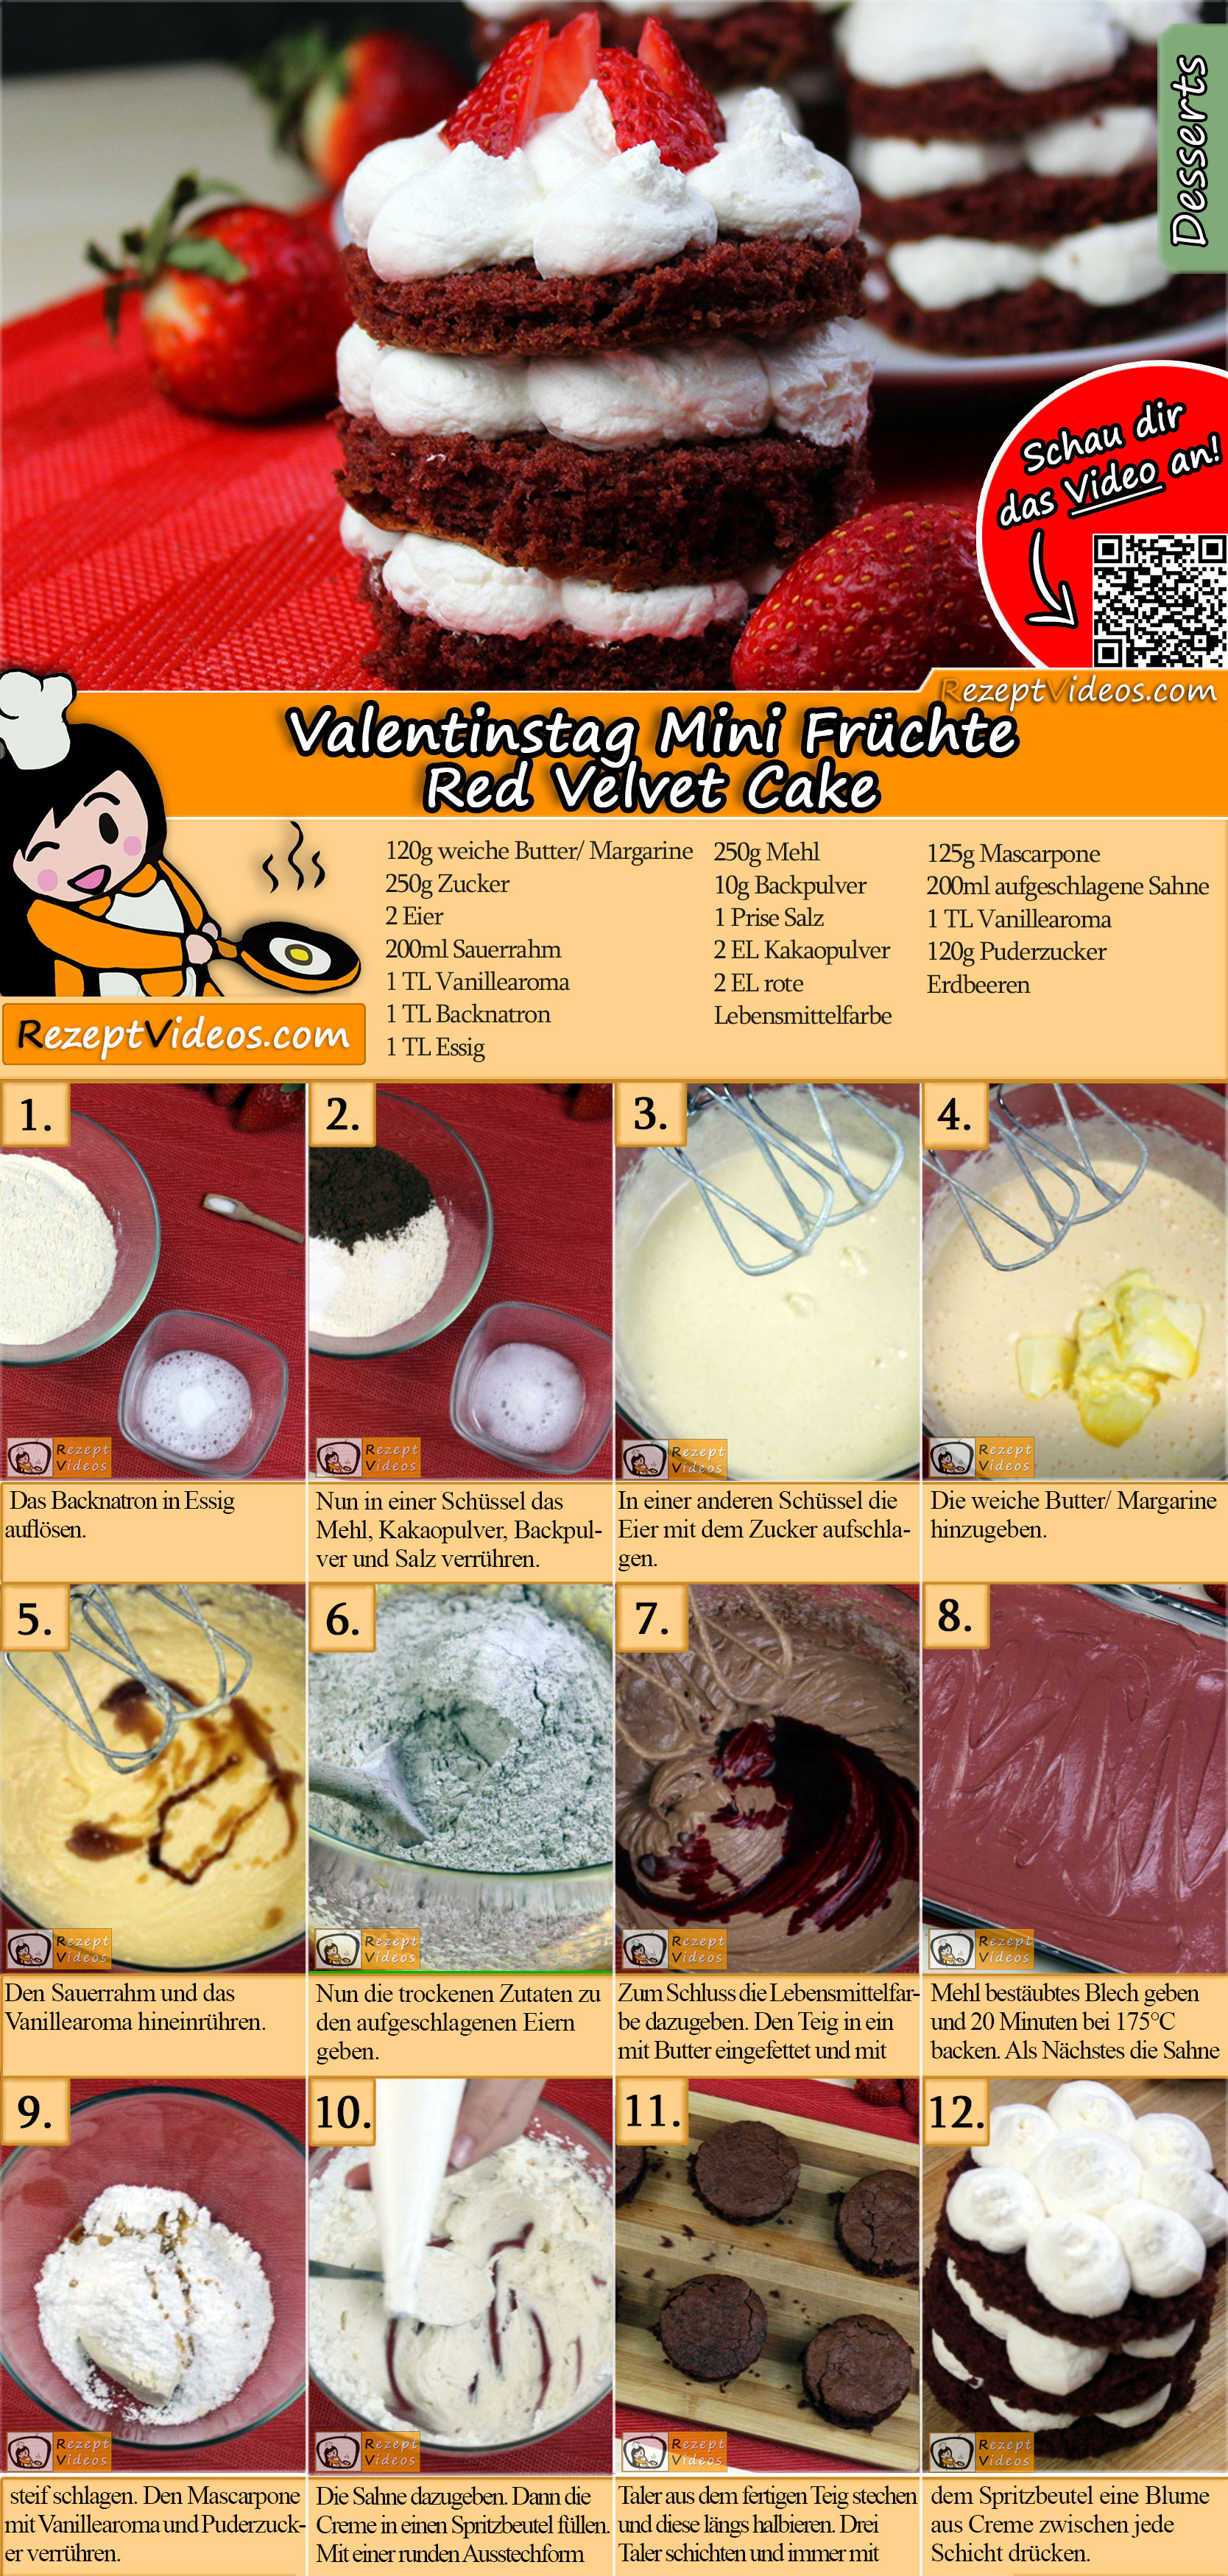 Valentinstag Mini Fruchte Red Velvet Cake Rezept Mit Video